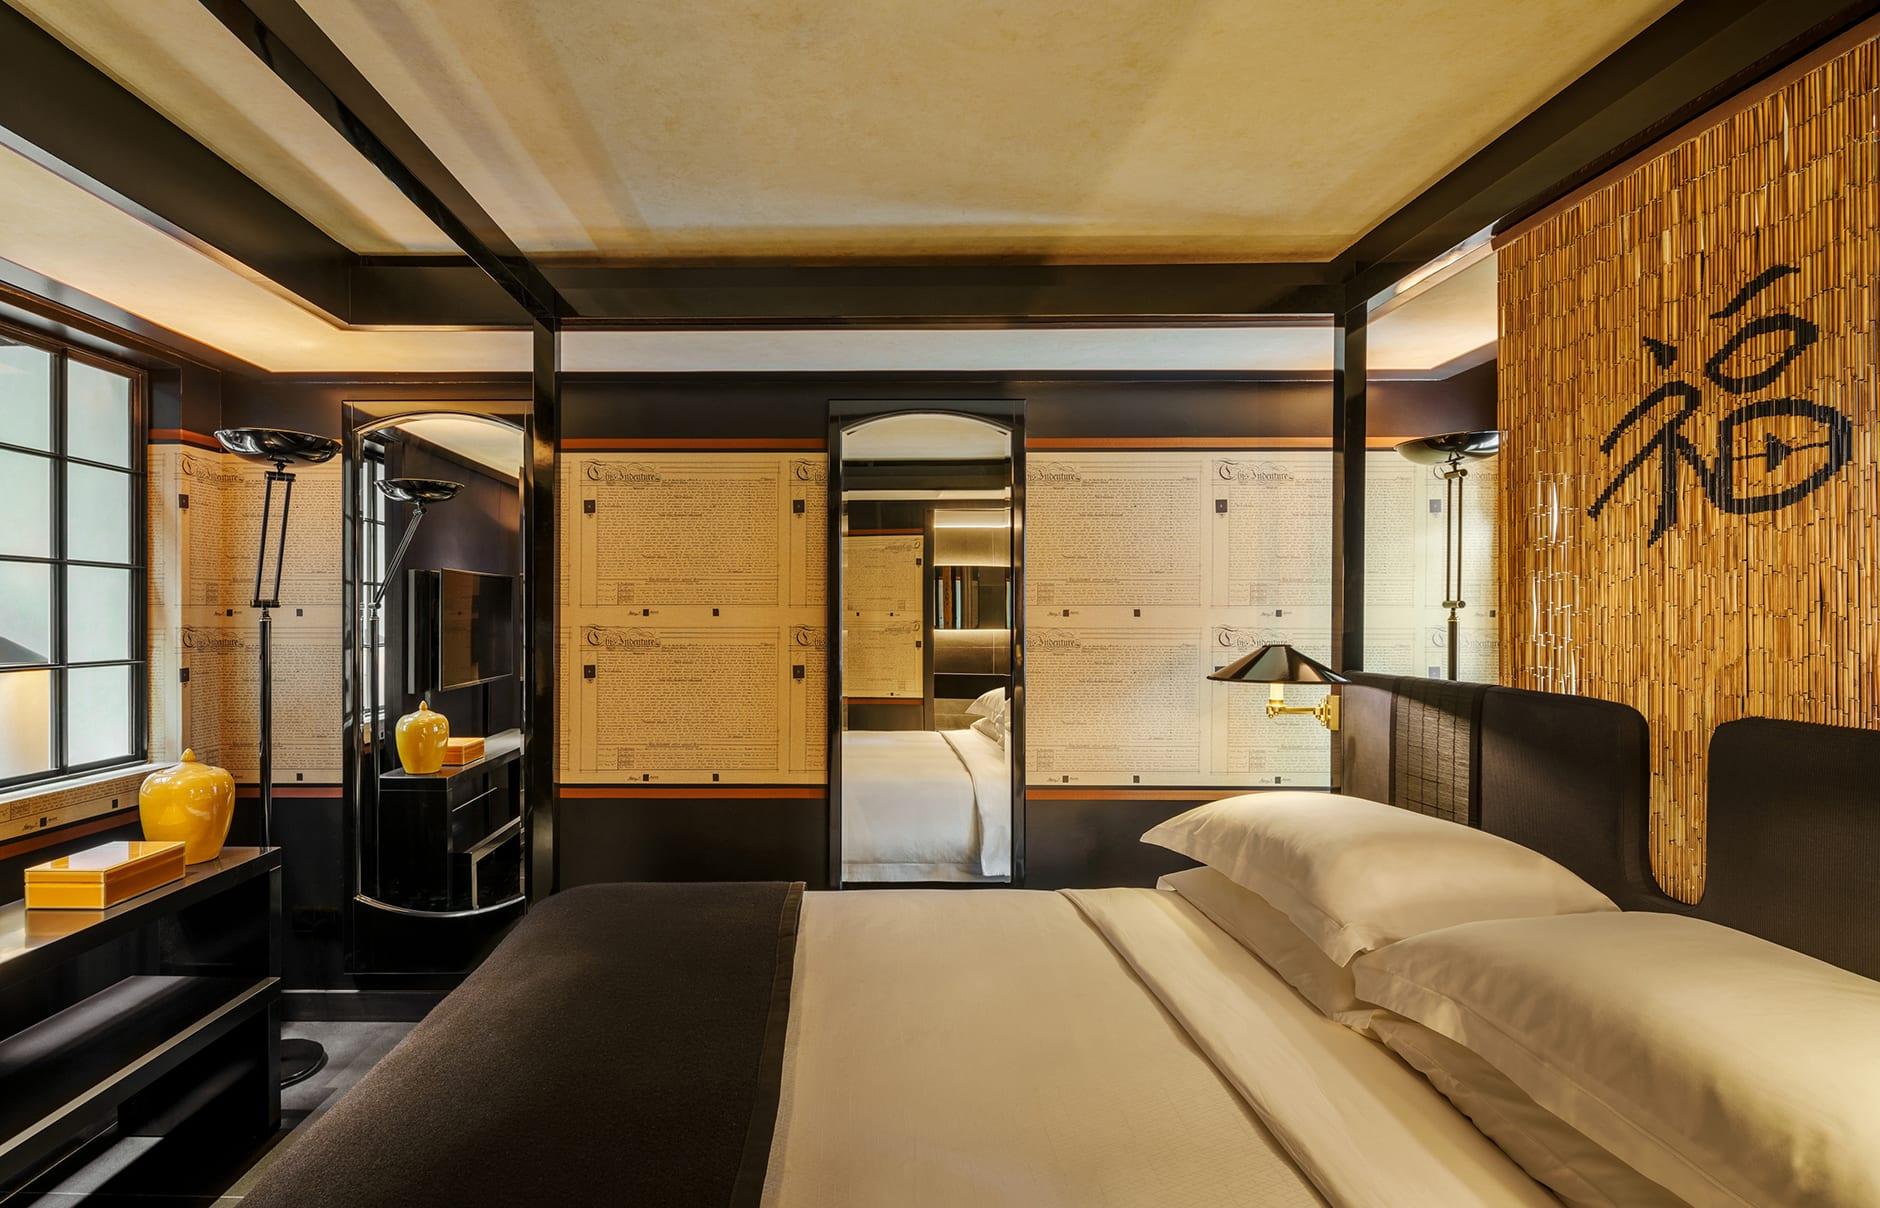 Six Senses Duxton, Singapore. Skylight Suite bedroom. Luxury Hotel Review by TravelPlusStyle. Photo © Six Senses Hotels Resorts Spas